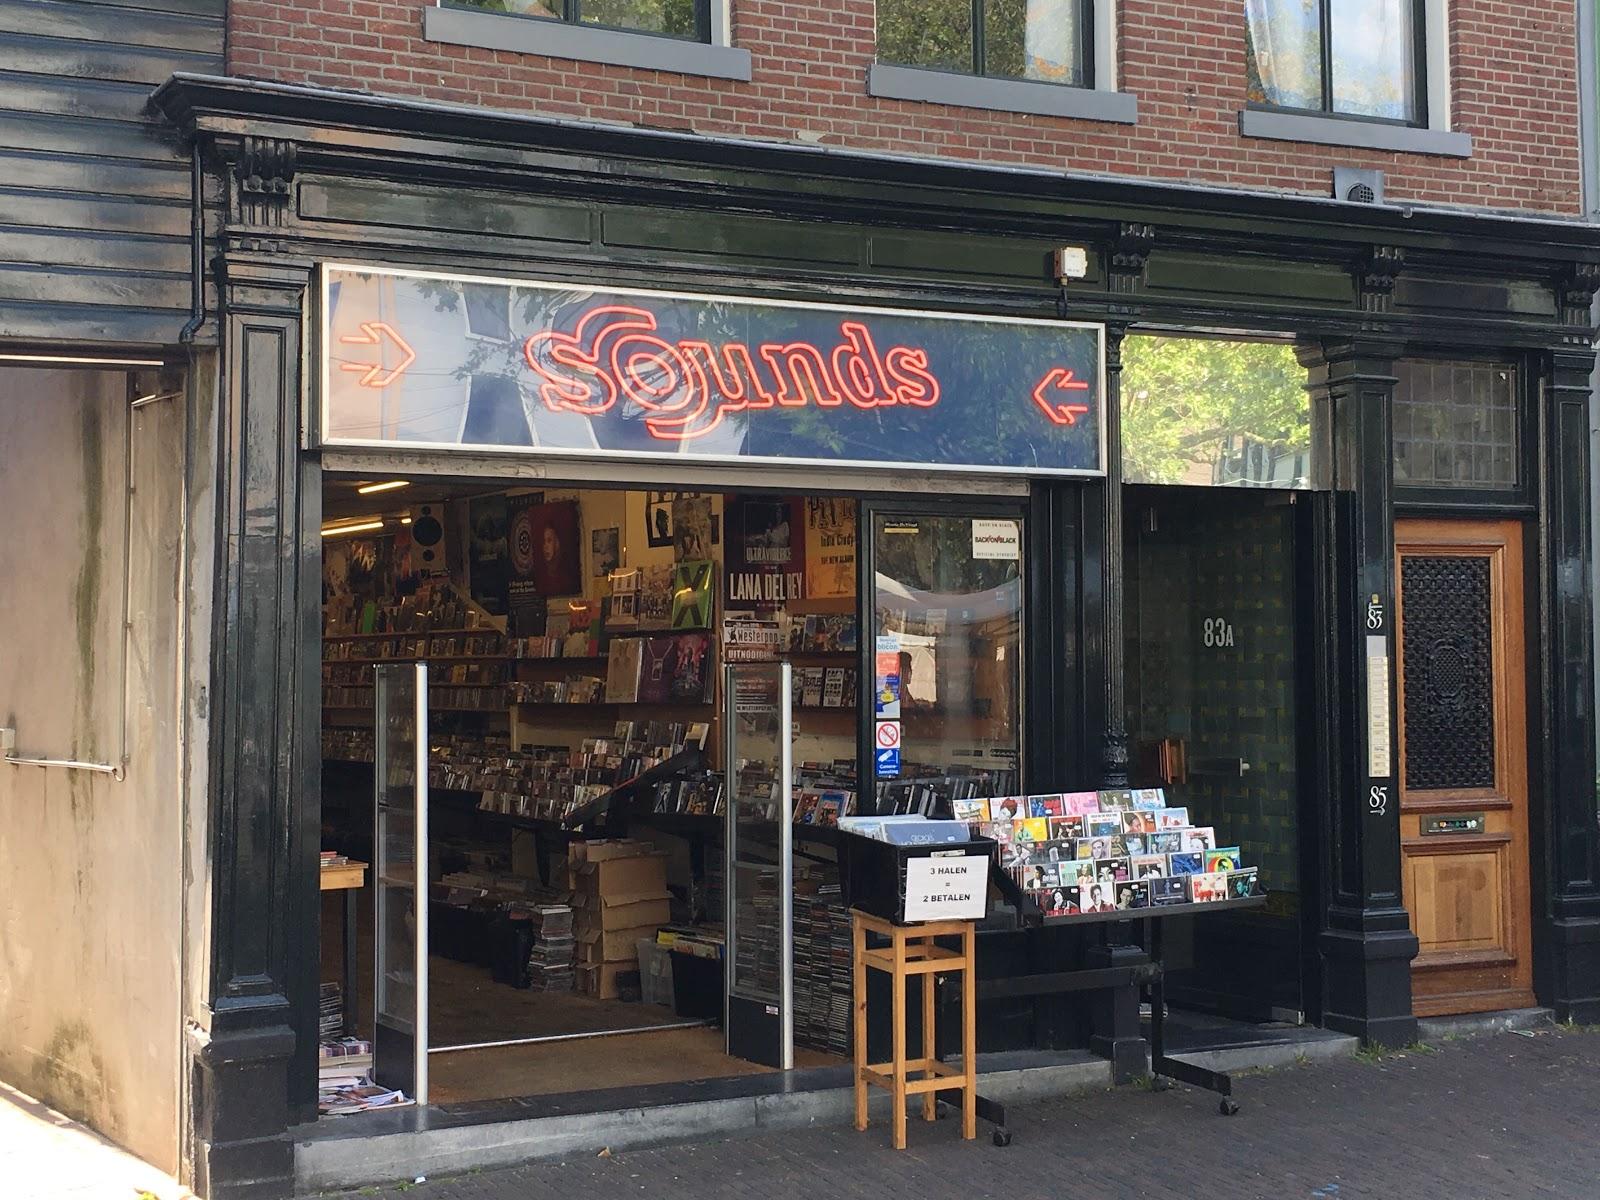 Sounds Delft Storefront